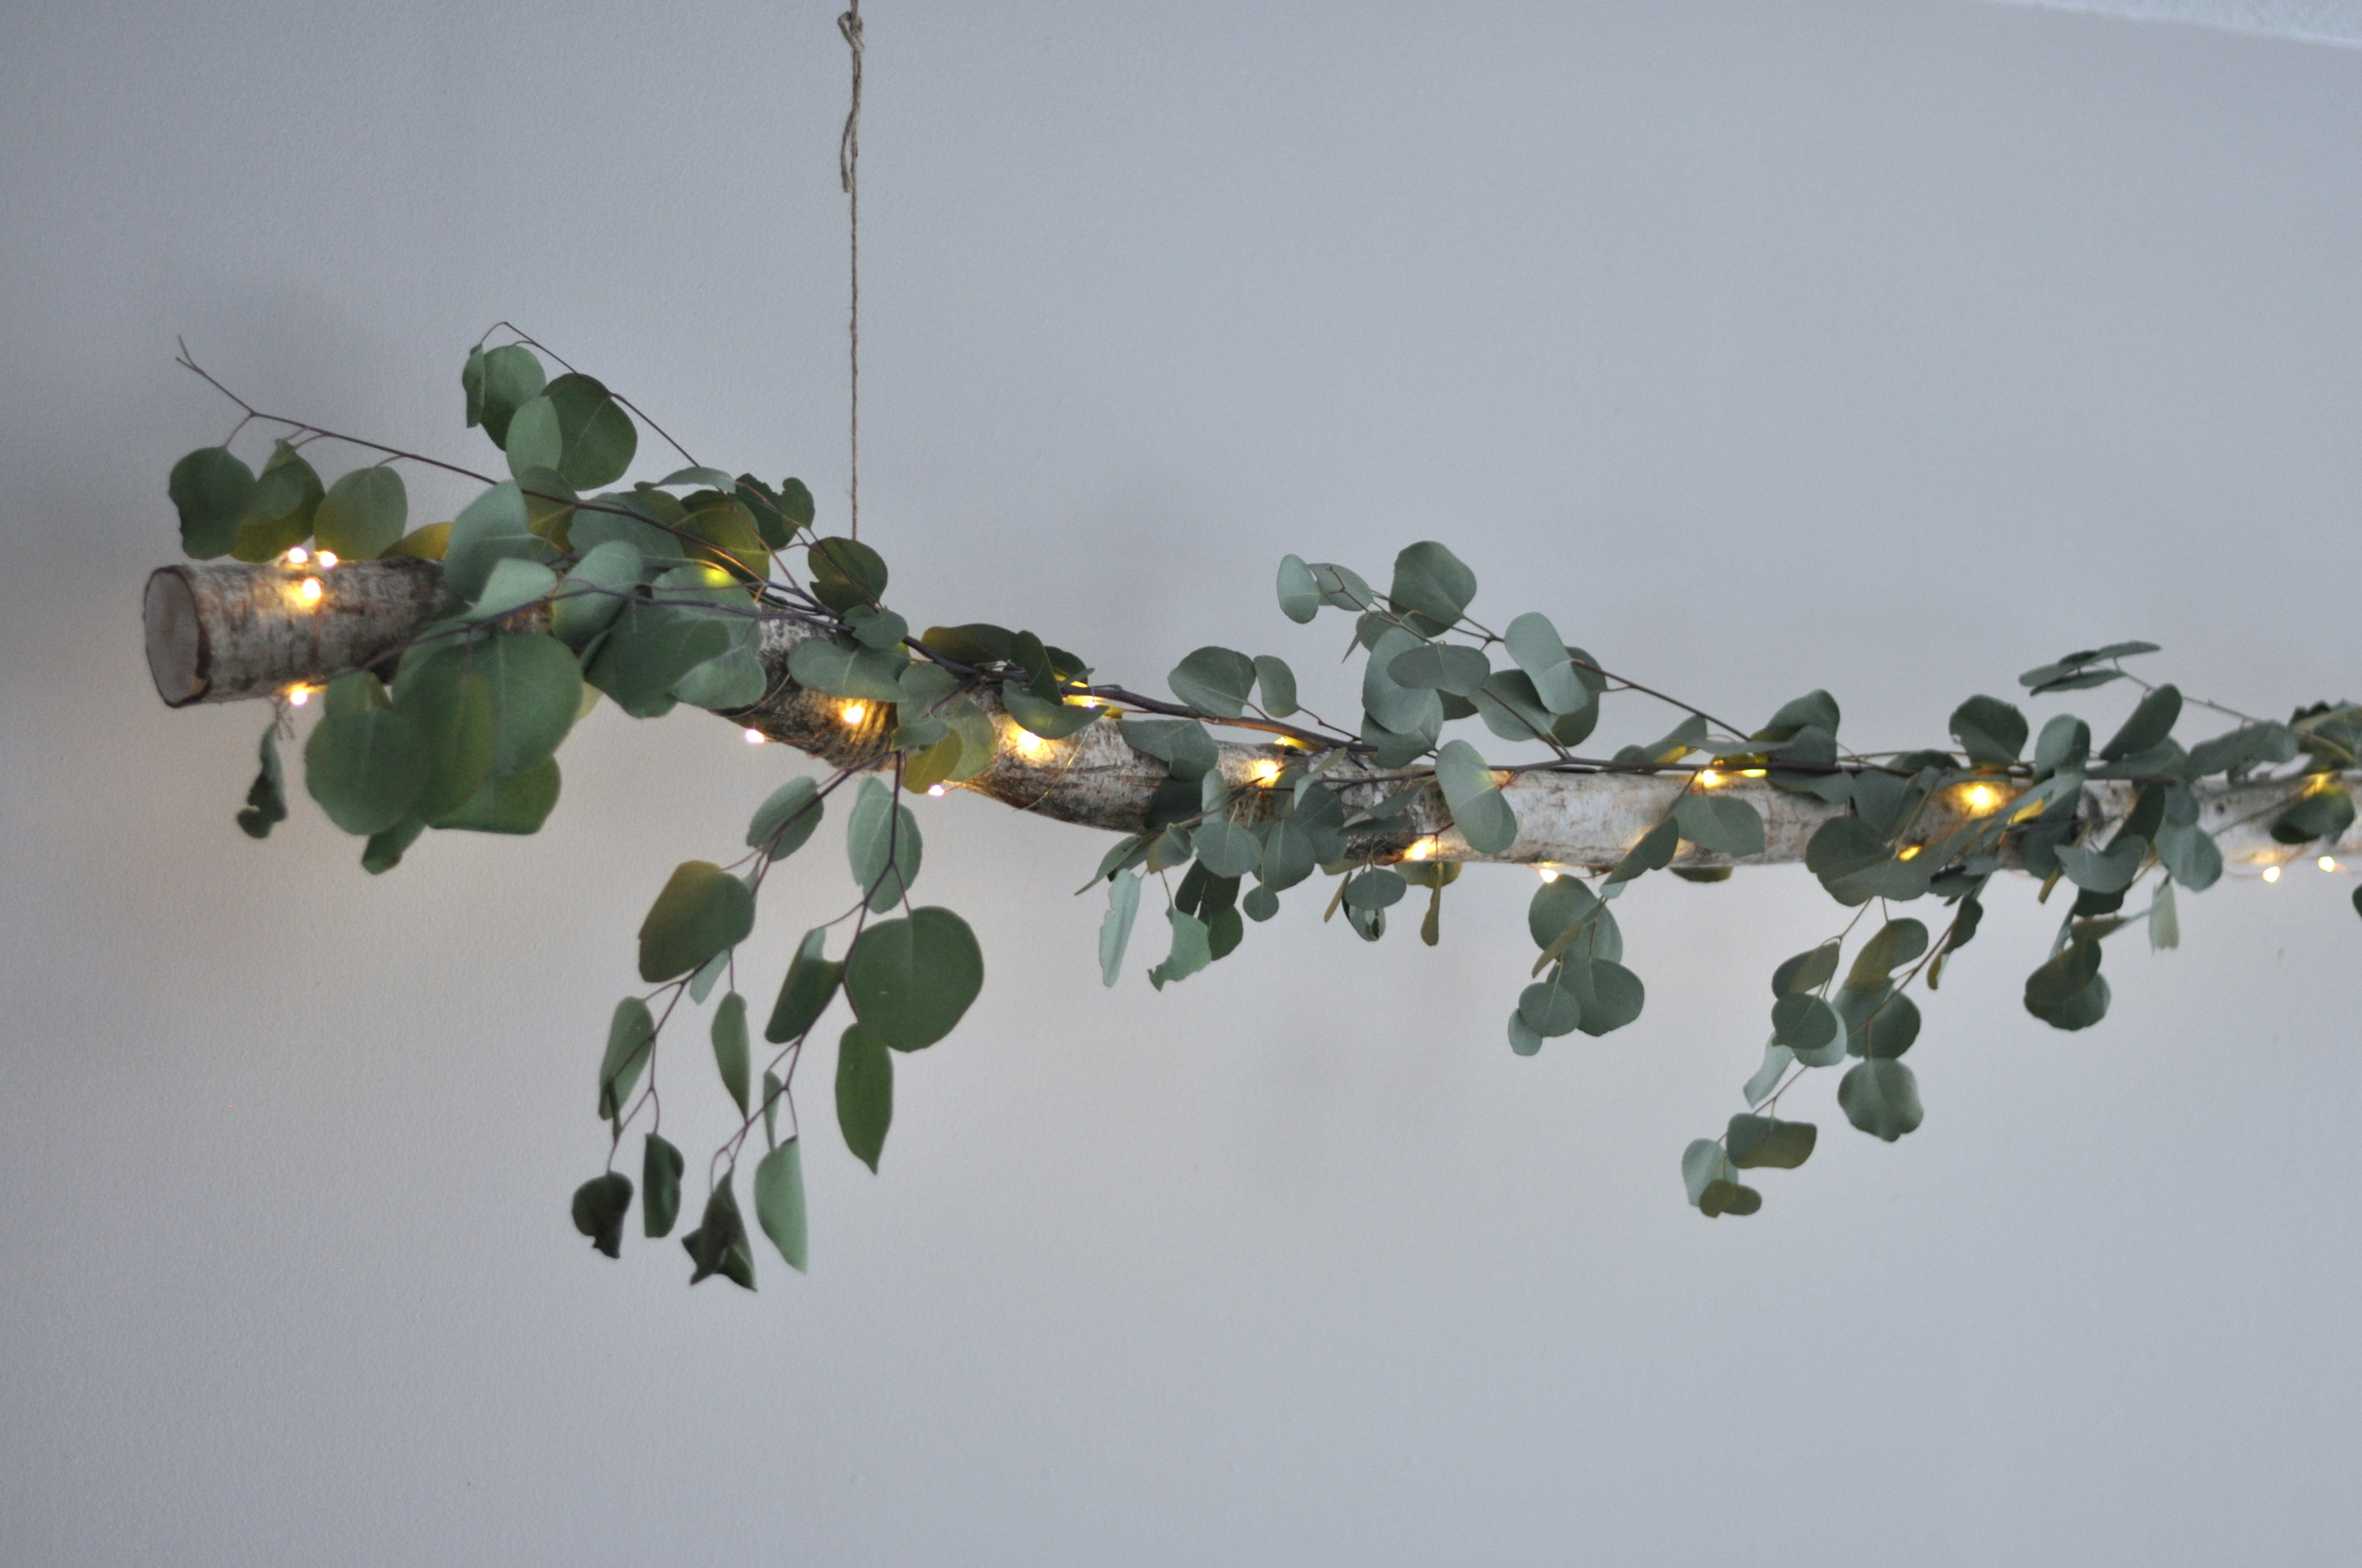 Birch Log With Fresh Eucalyptus and Twinkling Lights